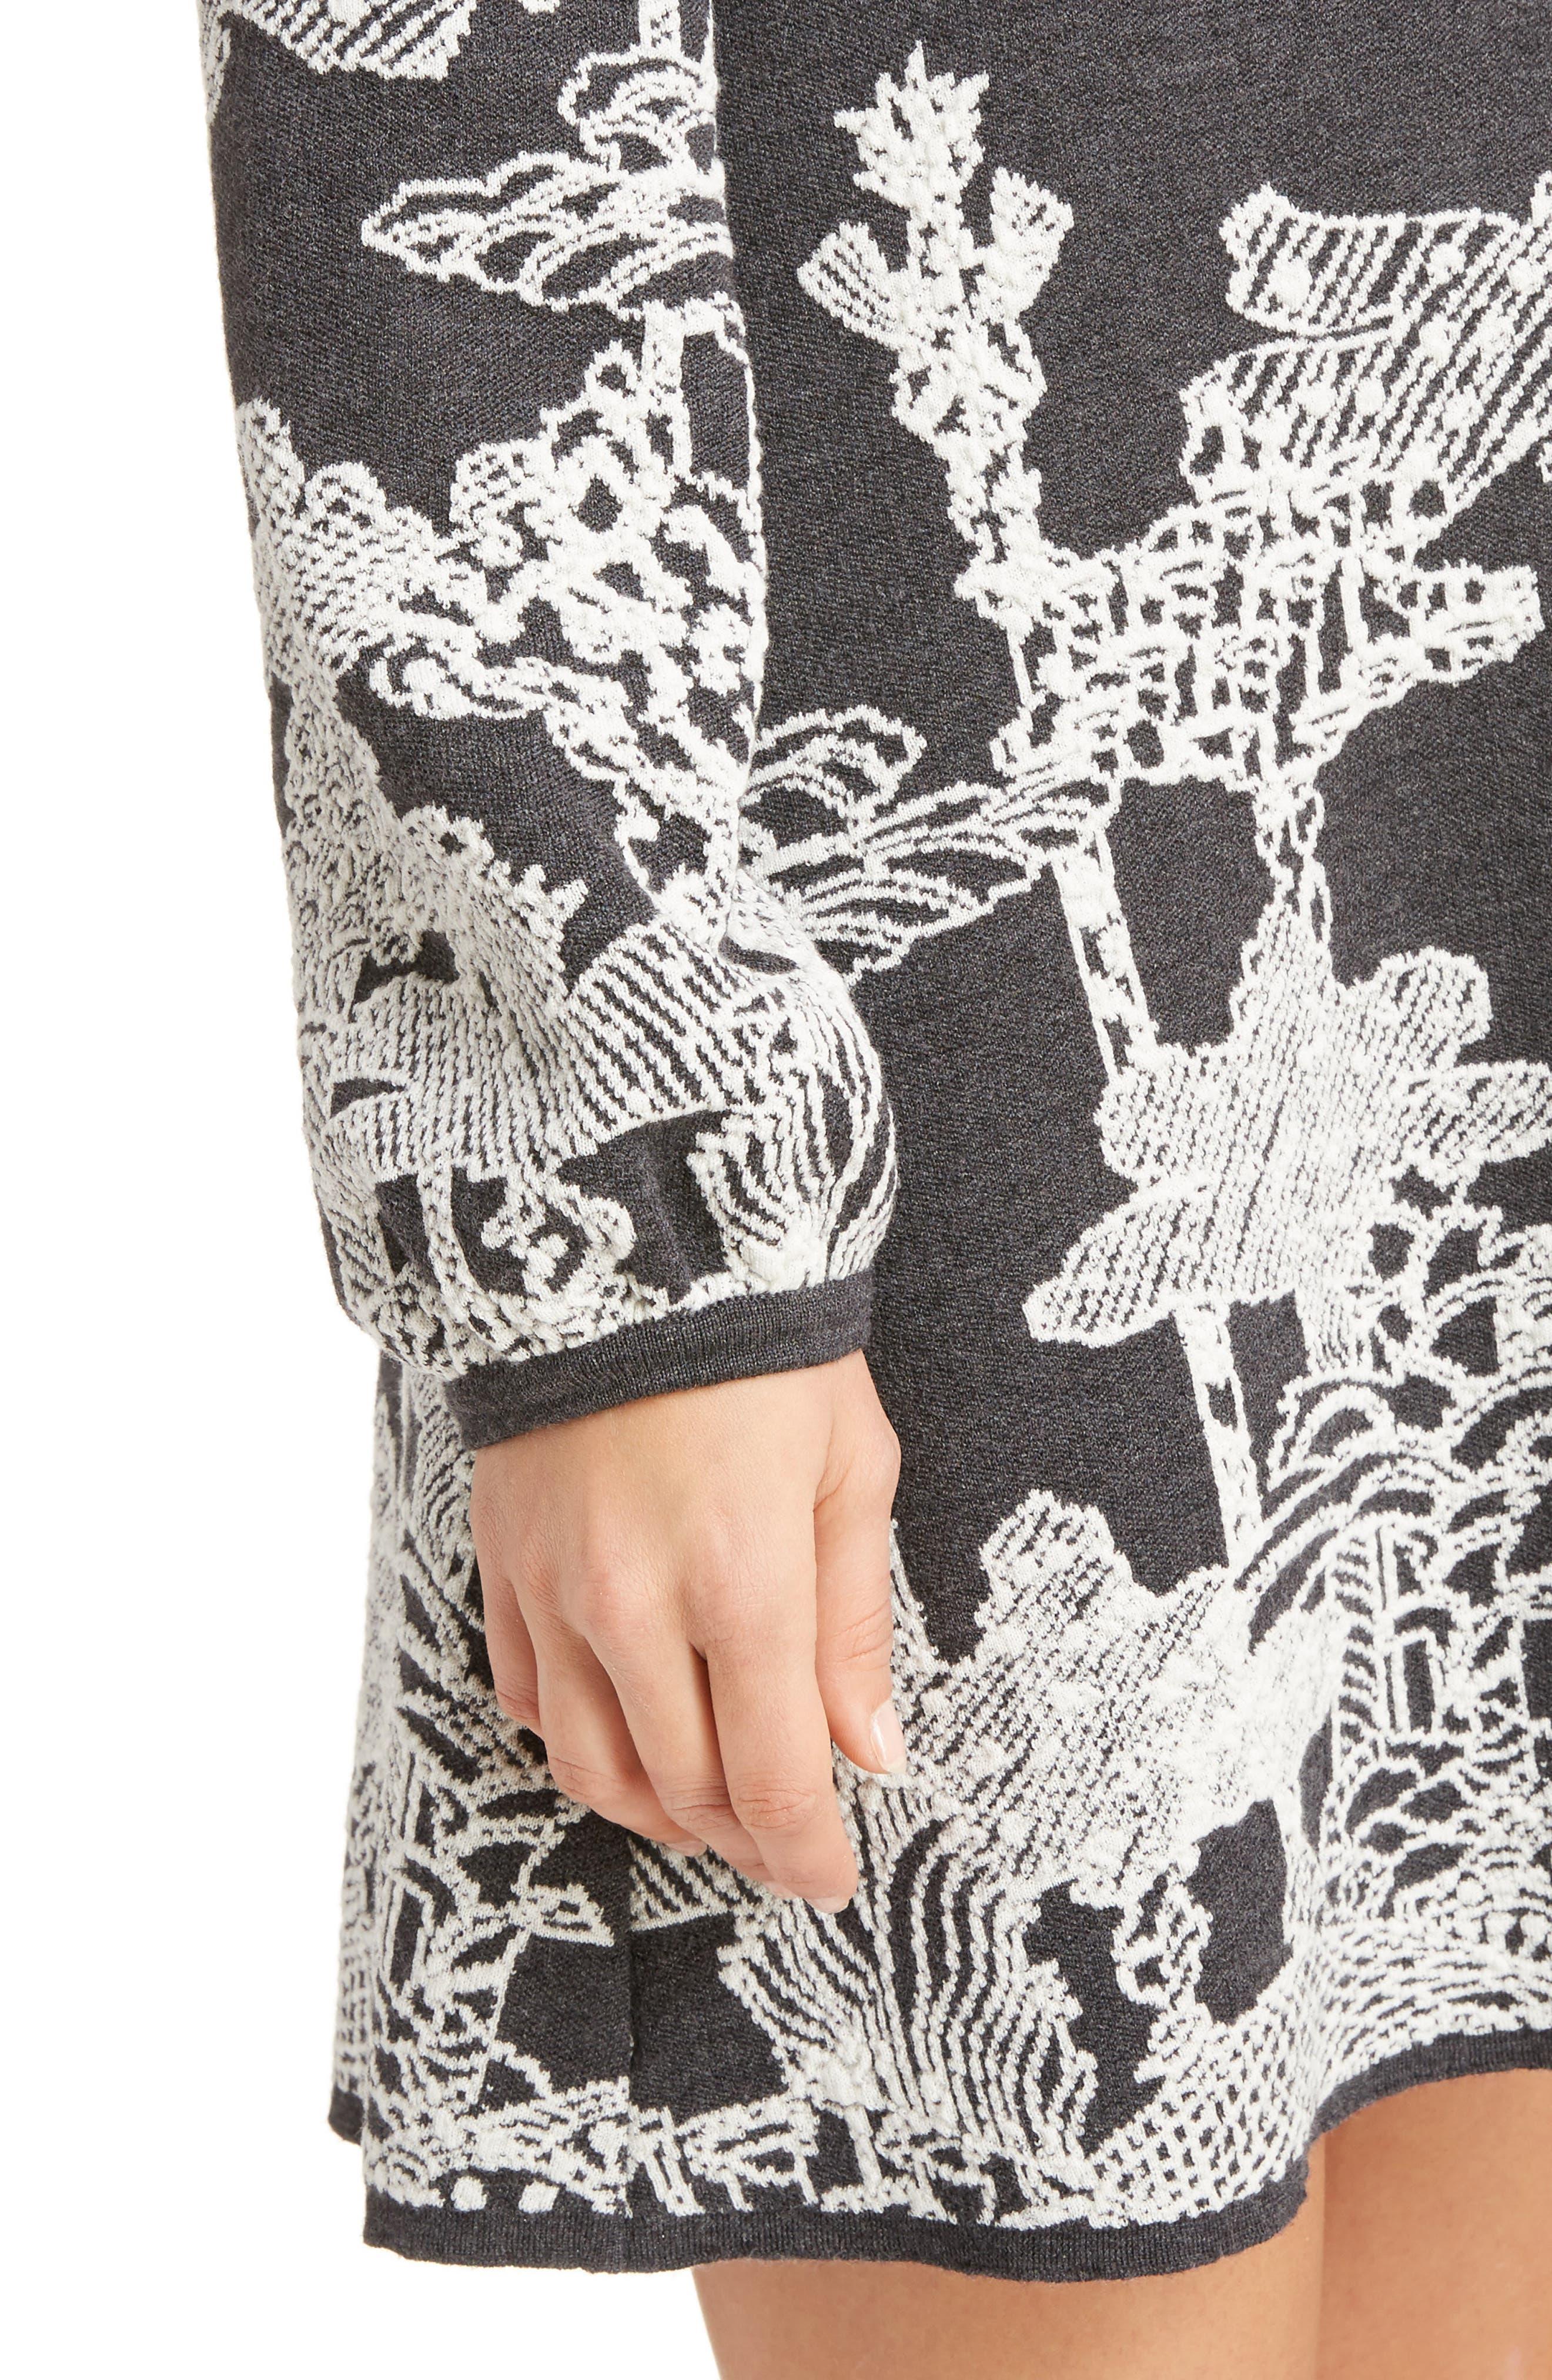 Merino Wool Dreamscape Jacquard Dress,                             Alternate thumbnail 4, color,                             020